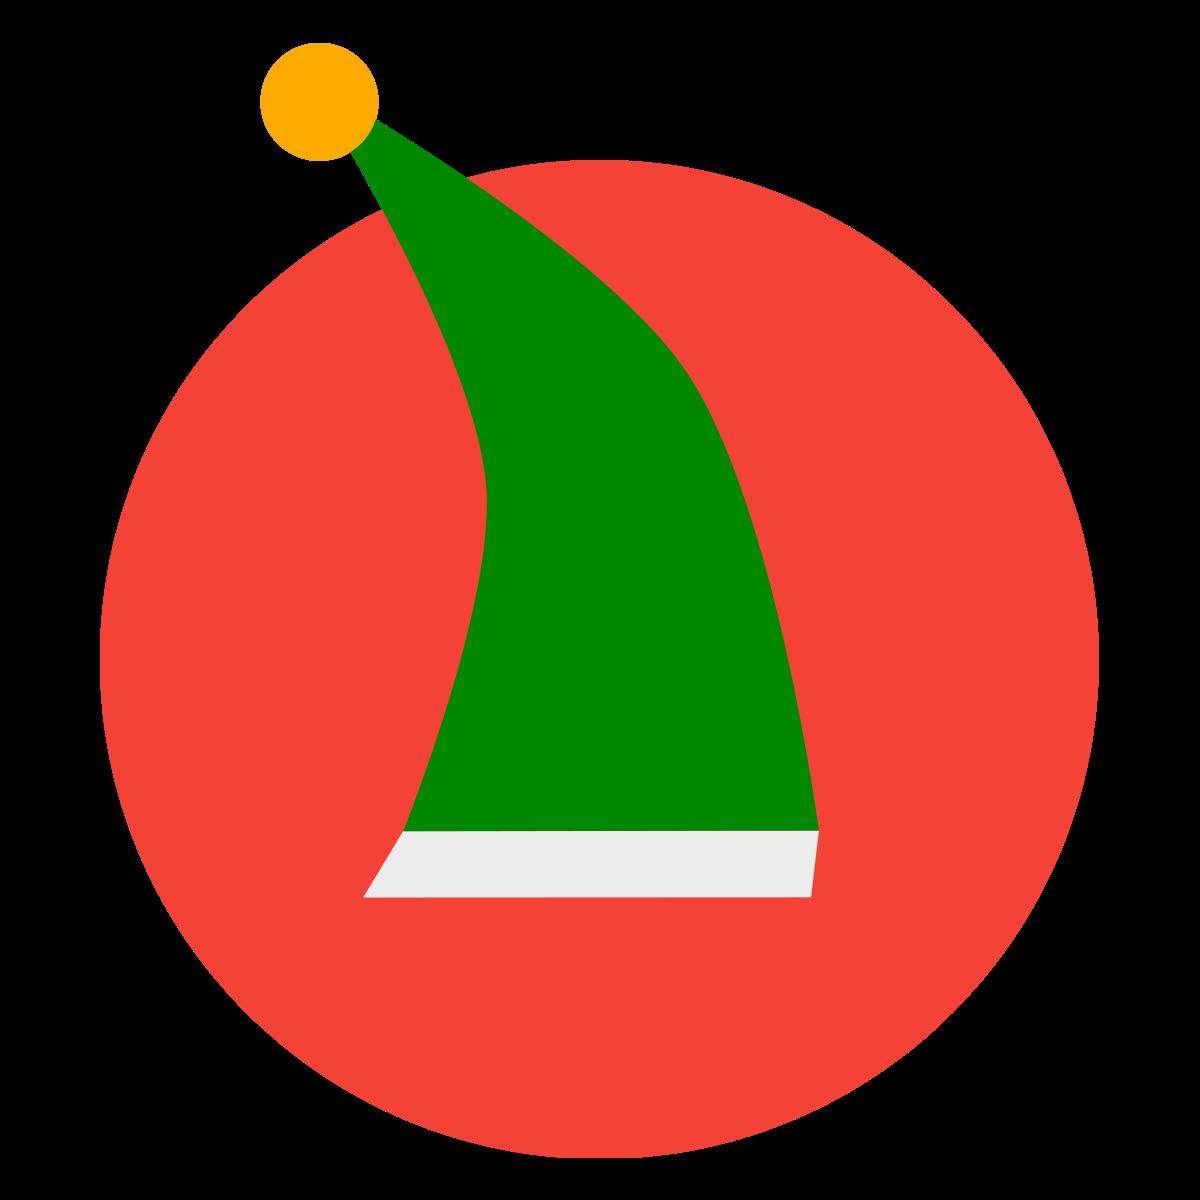 icons/elf-logo.icon.png